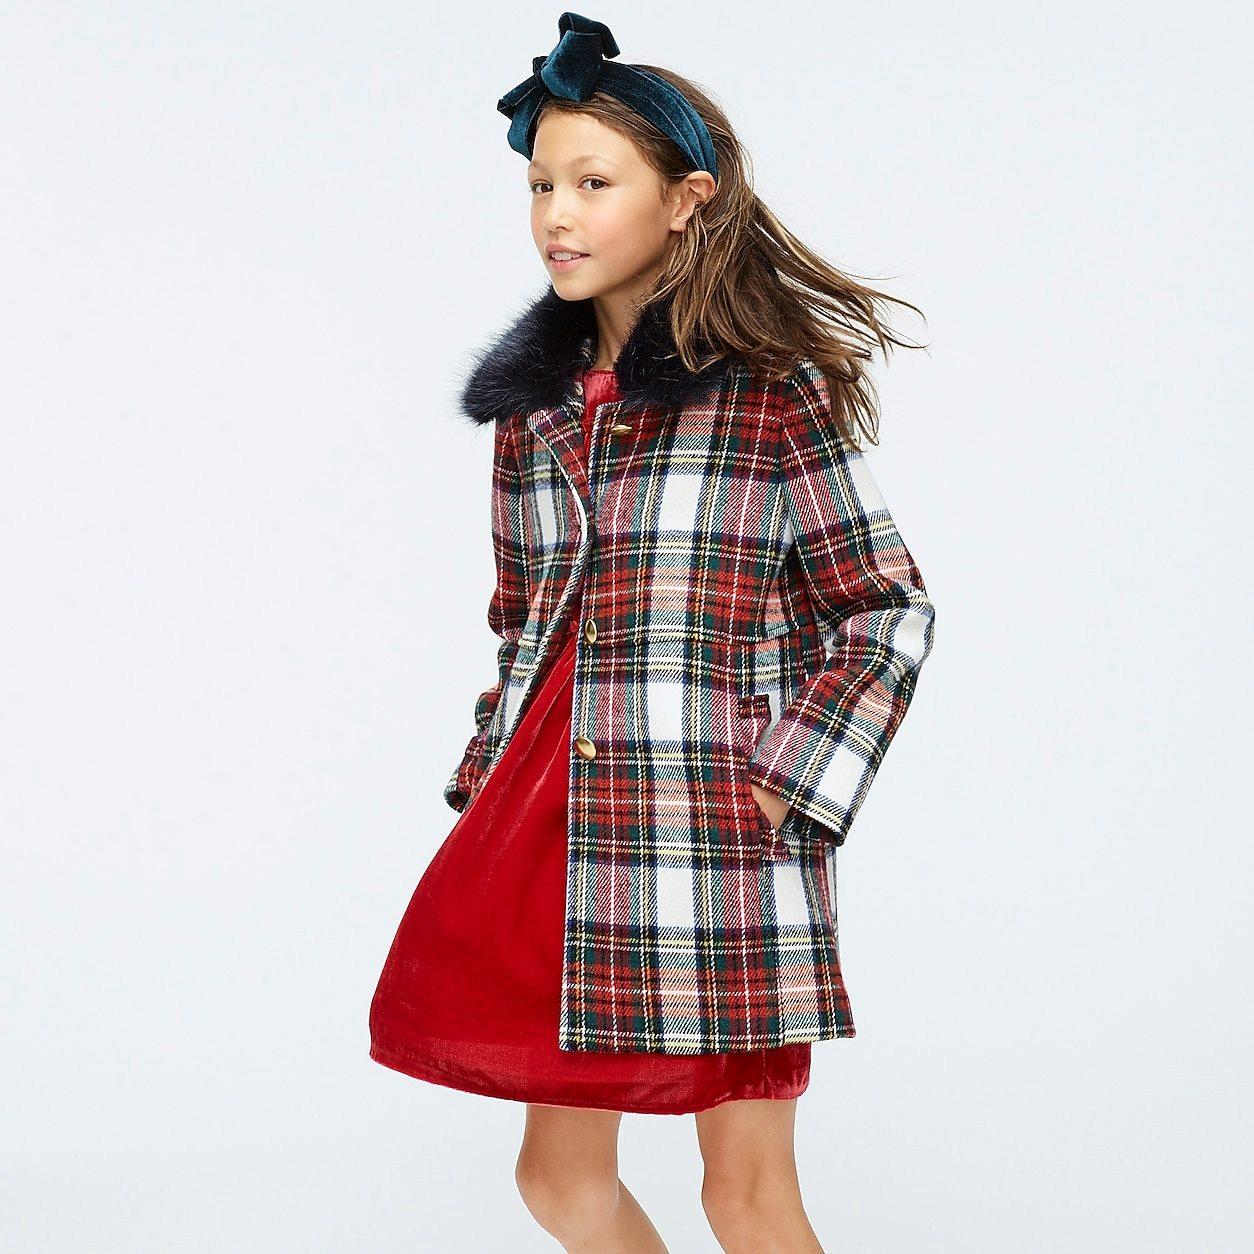 crewcuts Ruffle Trim Wool Coat In Snowy Stewart Tartan